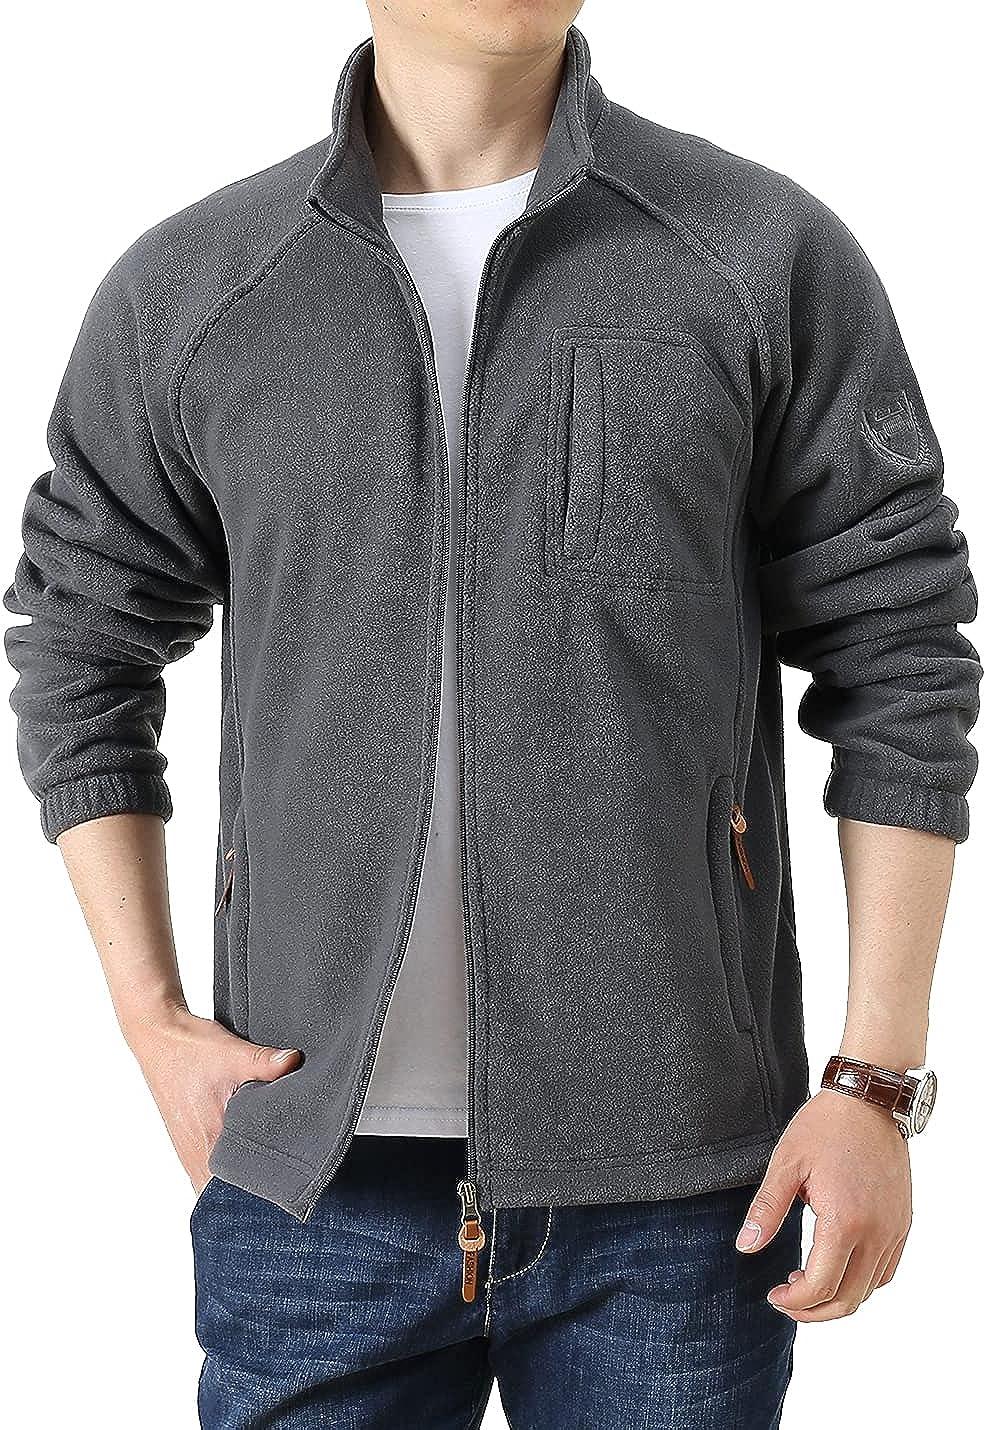 Locachy Men's Full-Zip Fleece Jacket Windproof Lightweight Outdoor Jackets with Pockets Hiking Work Outwear